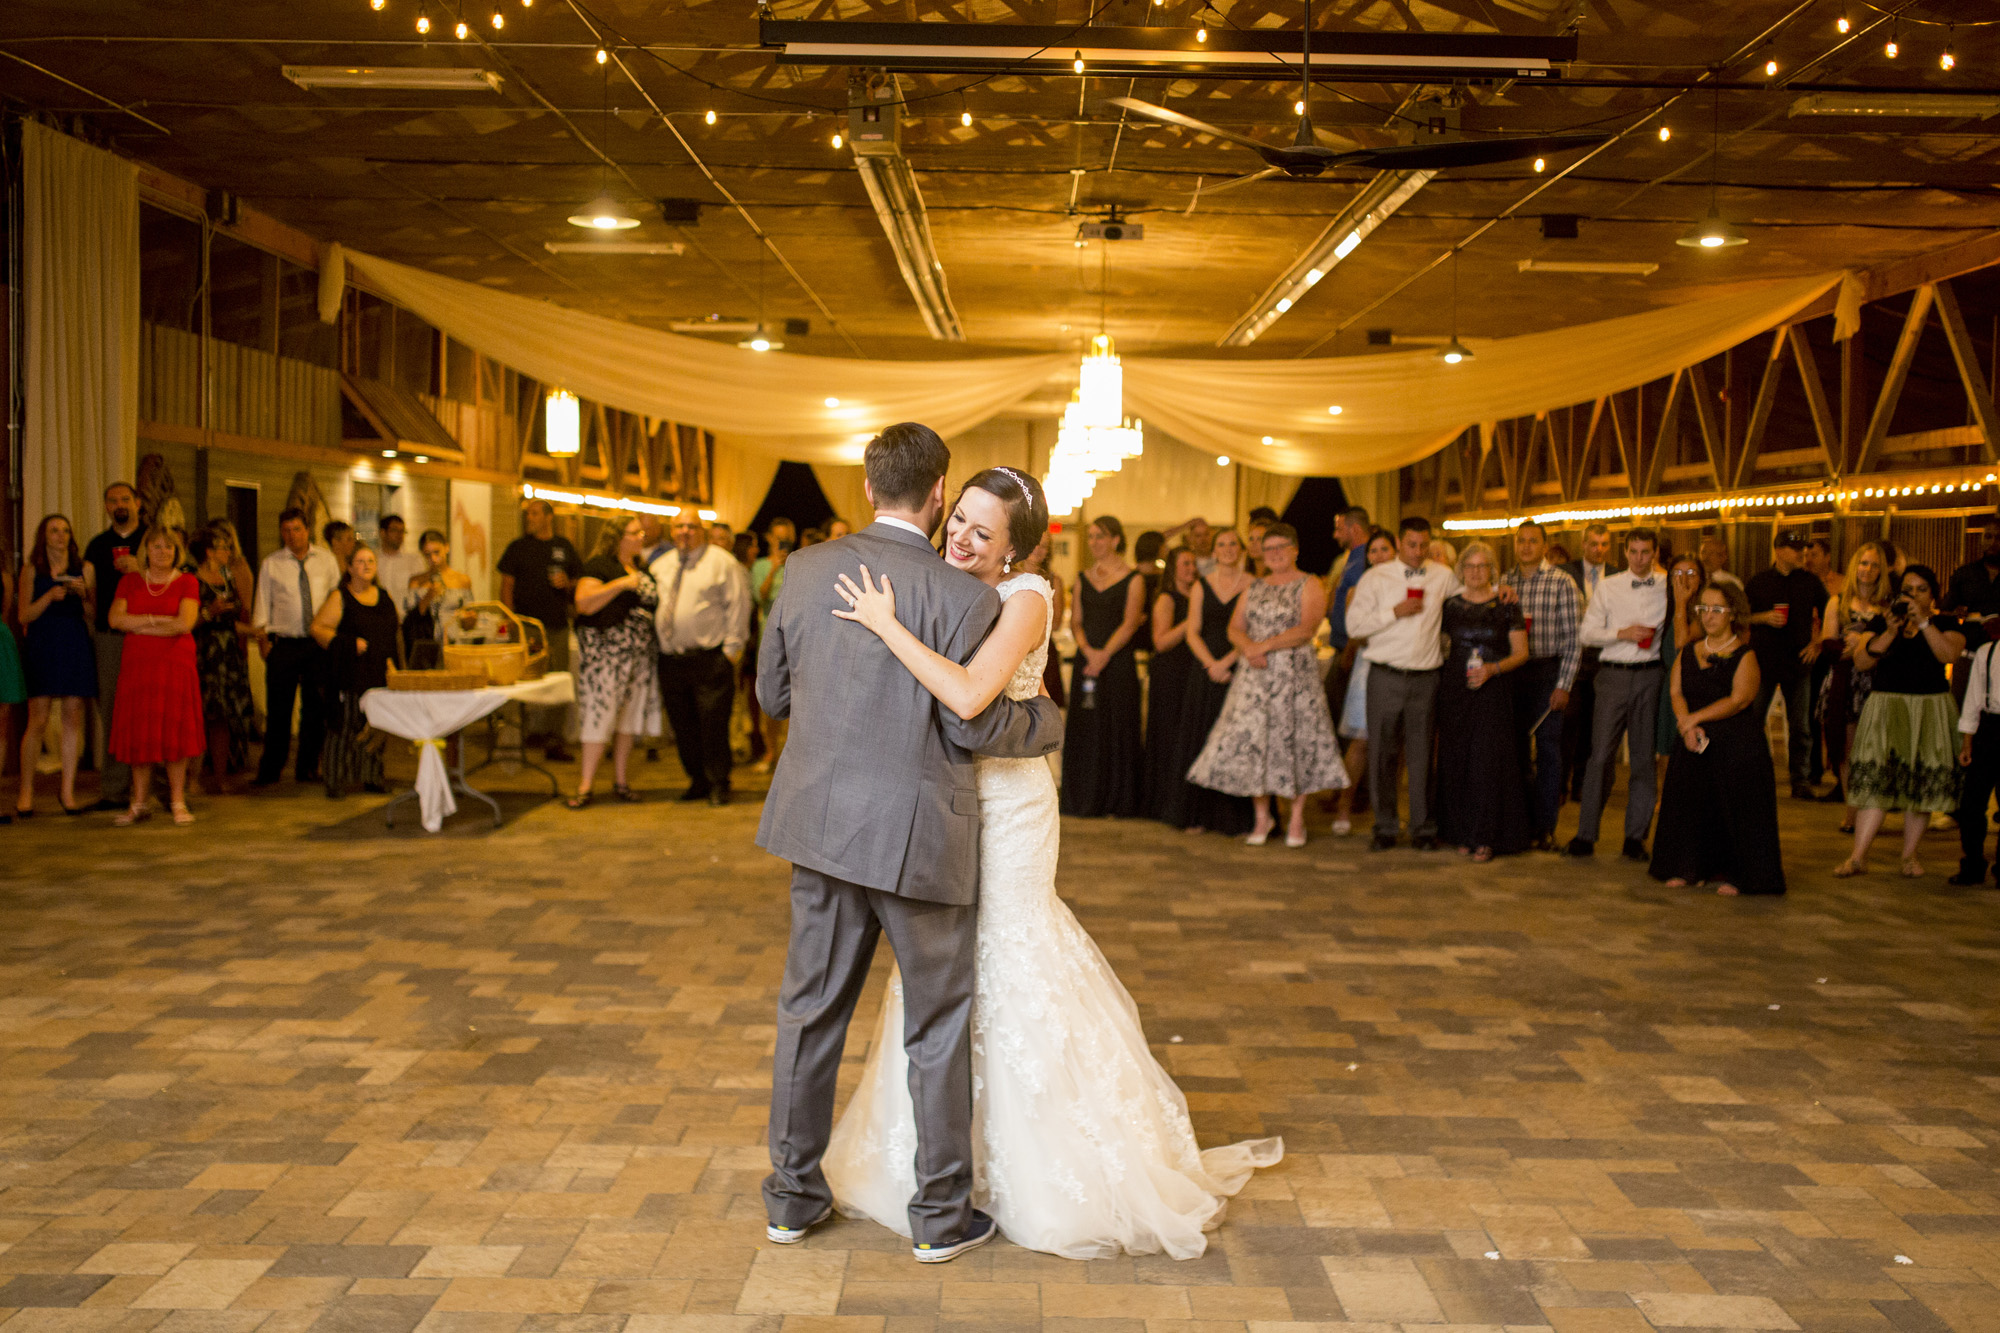 Seriously_Sabrina_Photography_Bowling_Green_Kentucky_Highland_Stables_Wedding_Wolff164.jpg